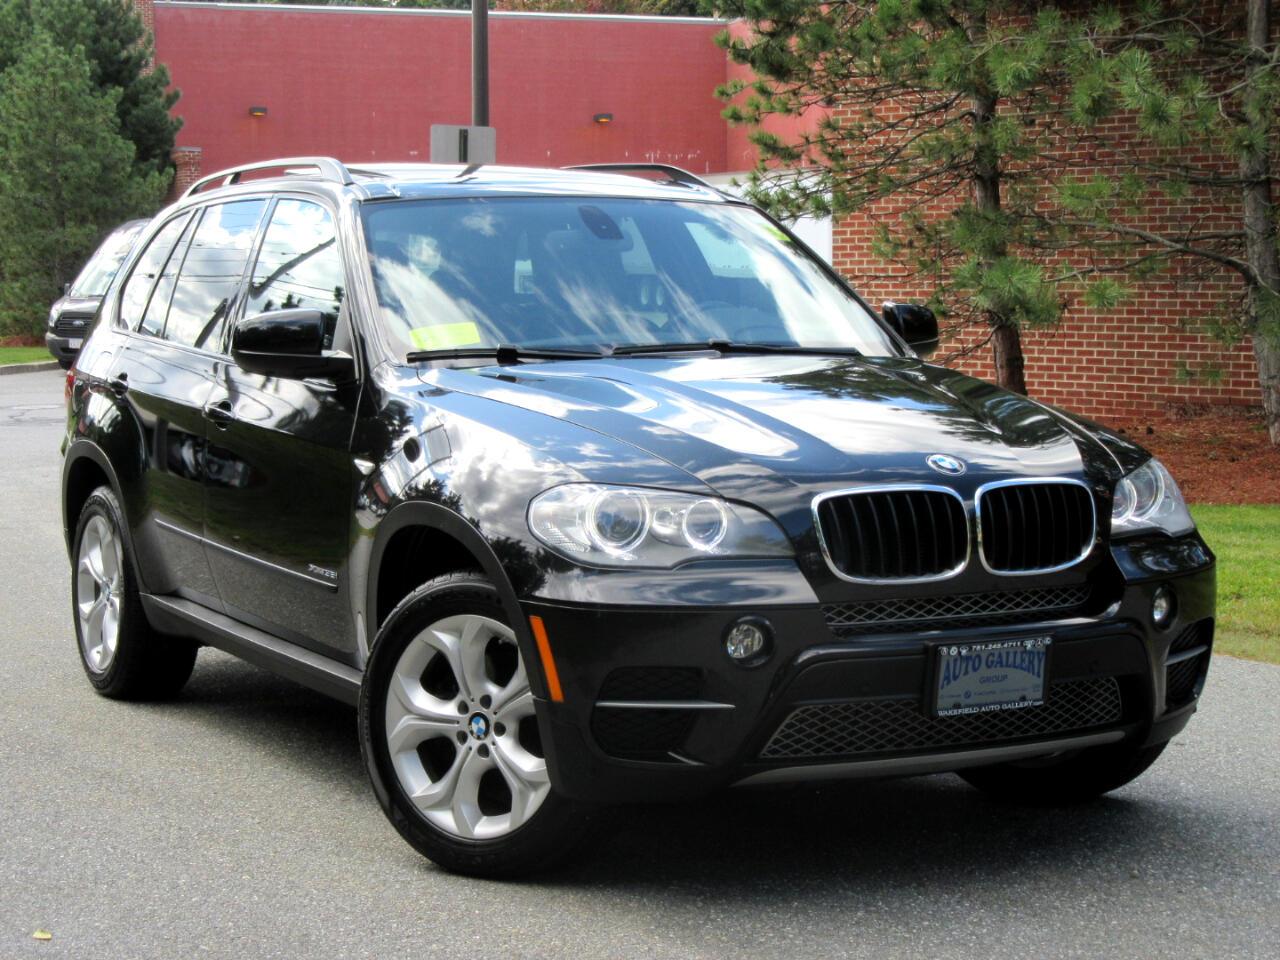 2013 BMW X5 AWD 4dr xDrive35i Sport Package Navigation Backup